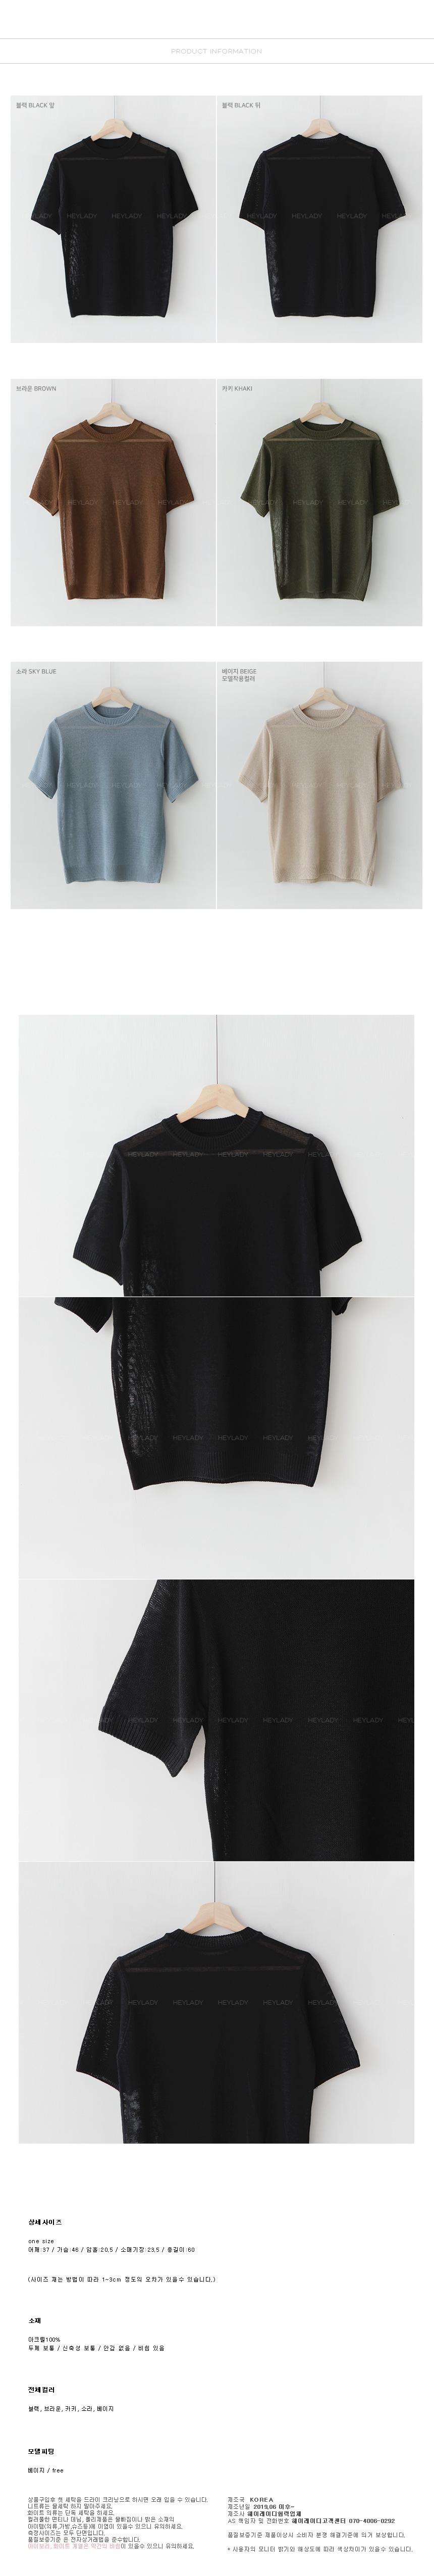 Short sleeve knit cowl